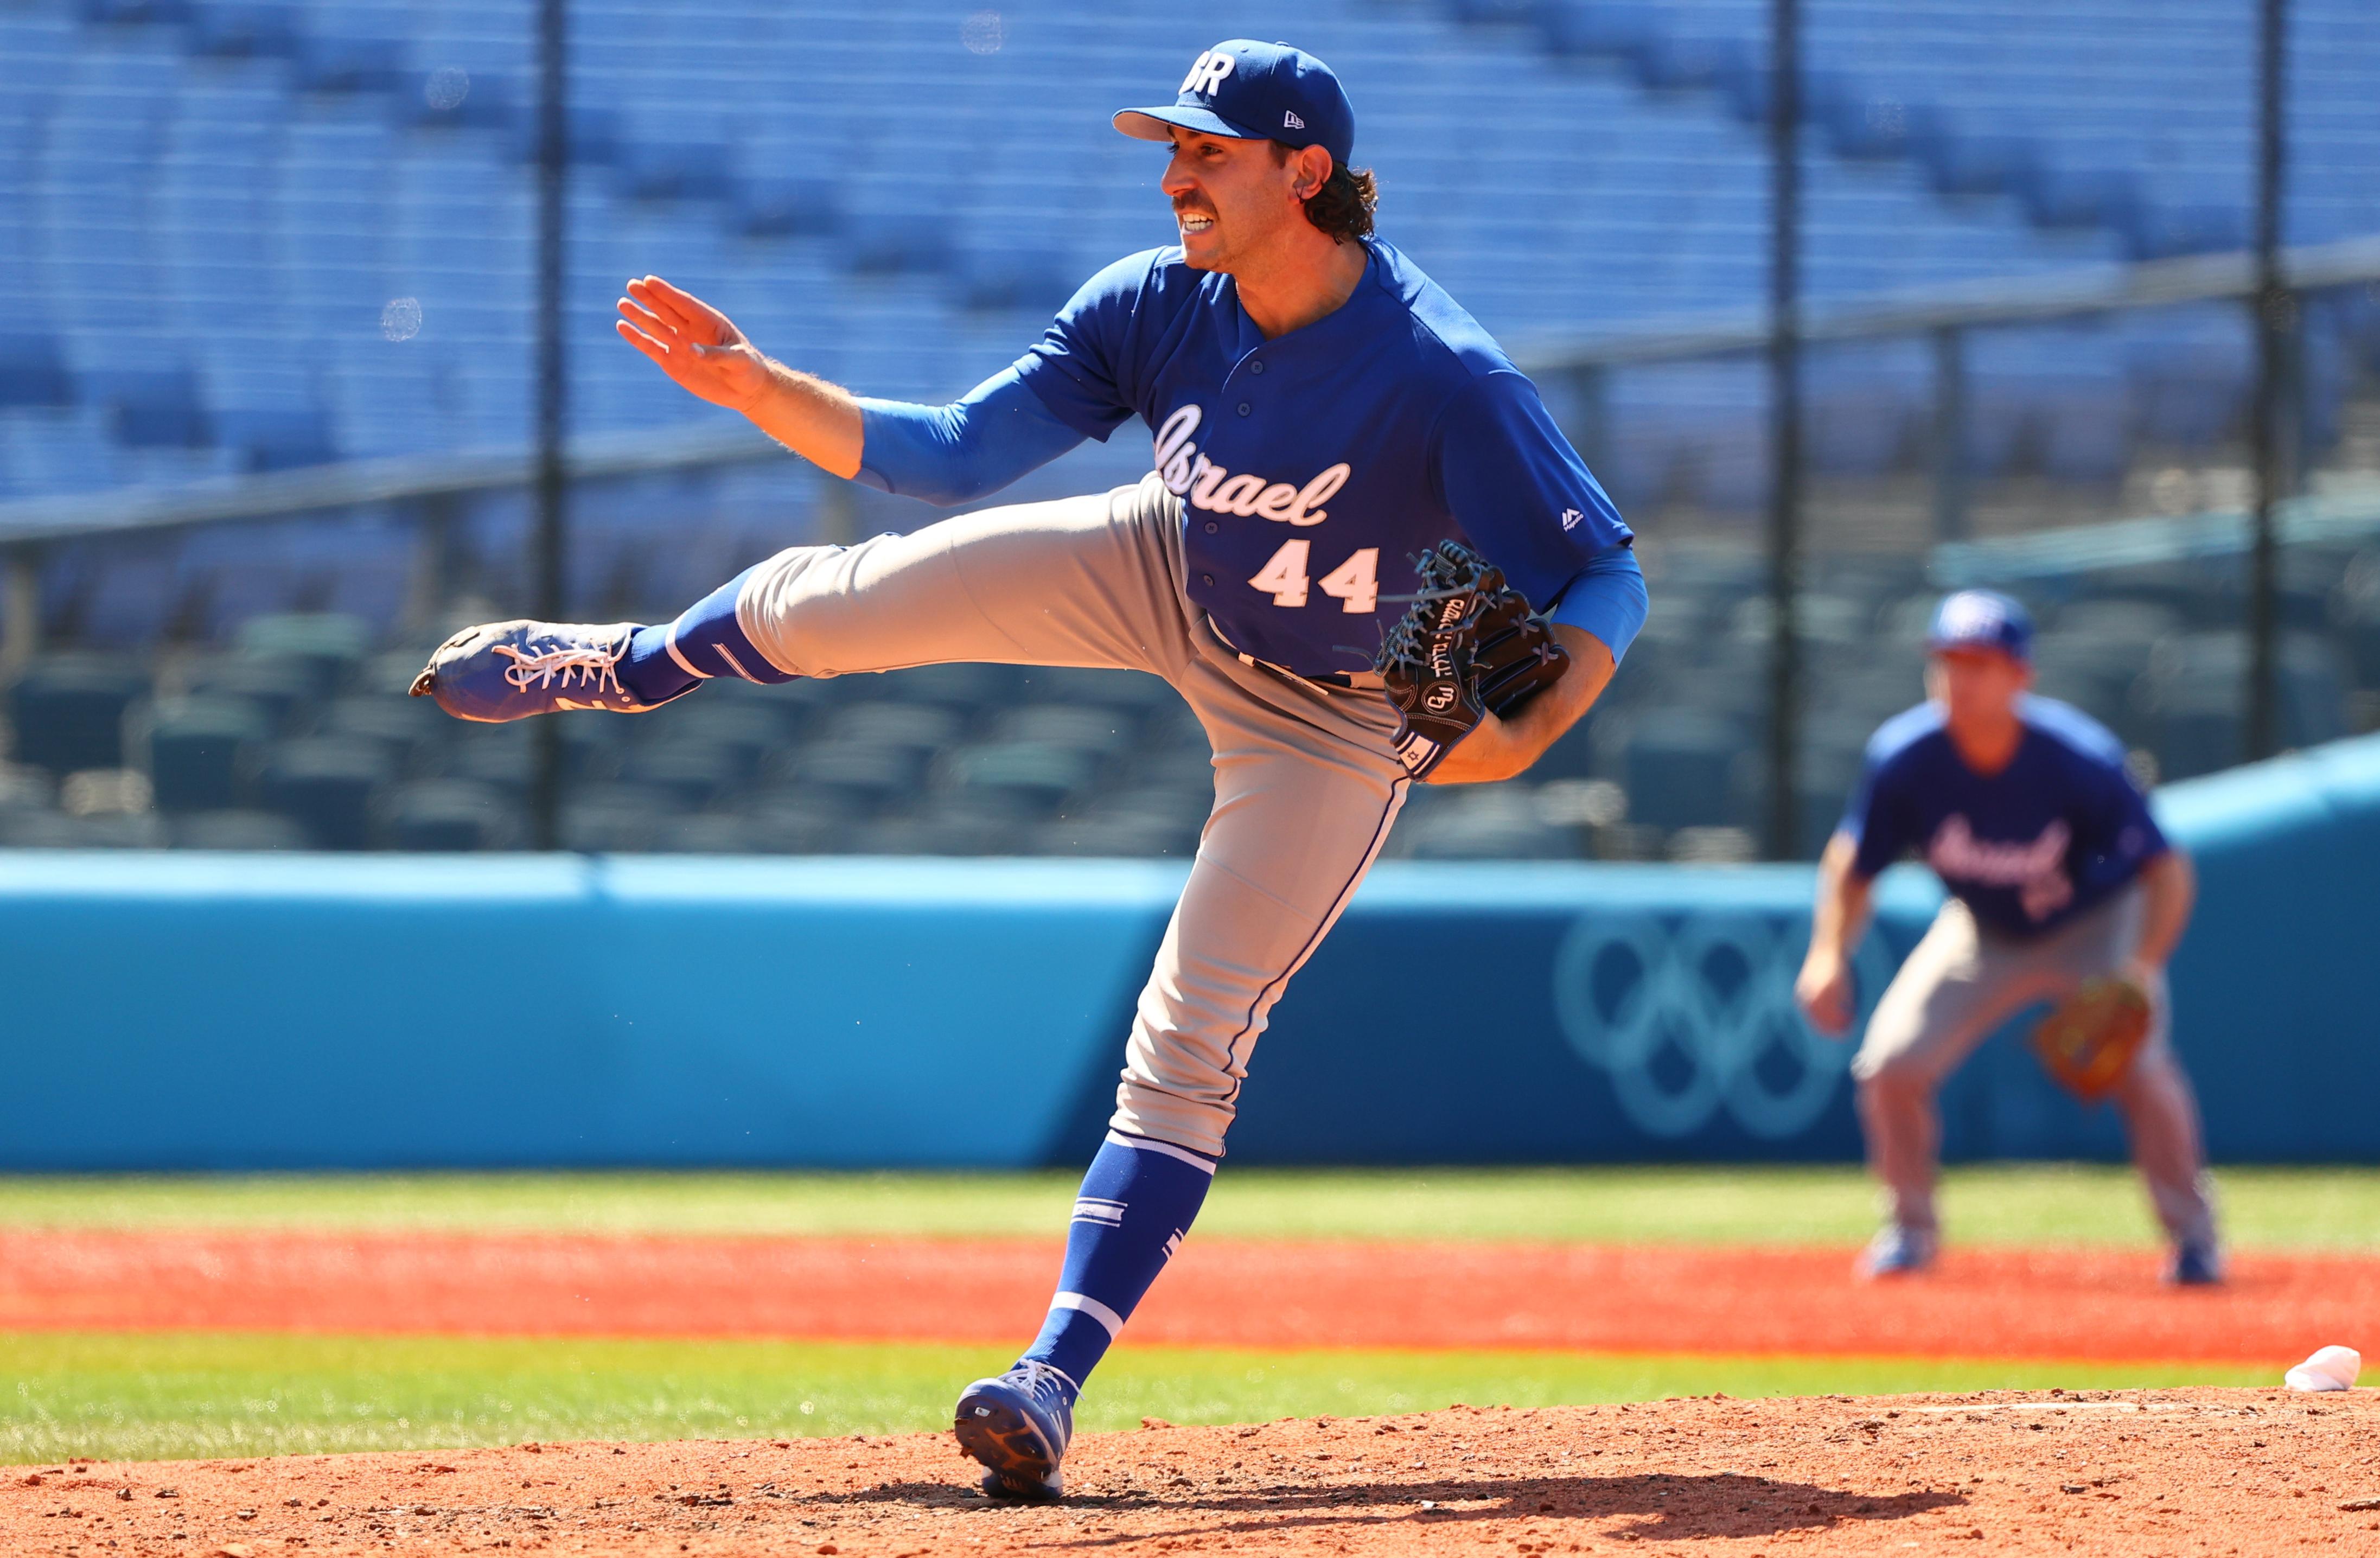 Tokyo 2020 Olympics - Baseball - Men - Knockout Round 1 - Israel v Mexico - Yokohama Baseball Stadium, Yokohama, Japan - August 1, 2021. Zack Weiss of Israel in action. REUTERS/Jorge Silva